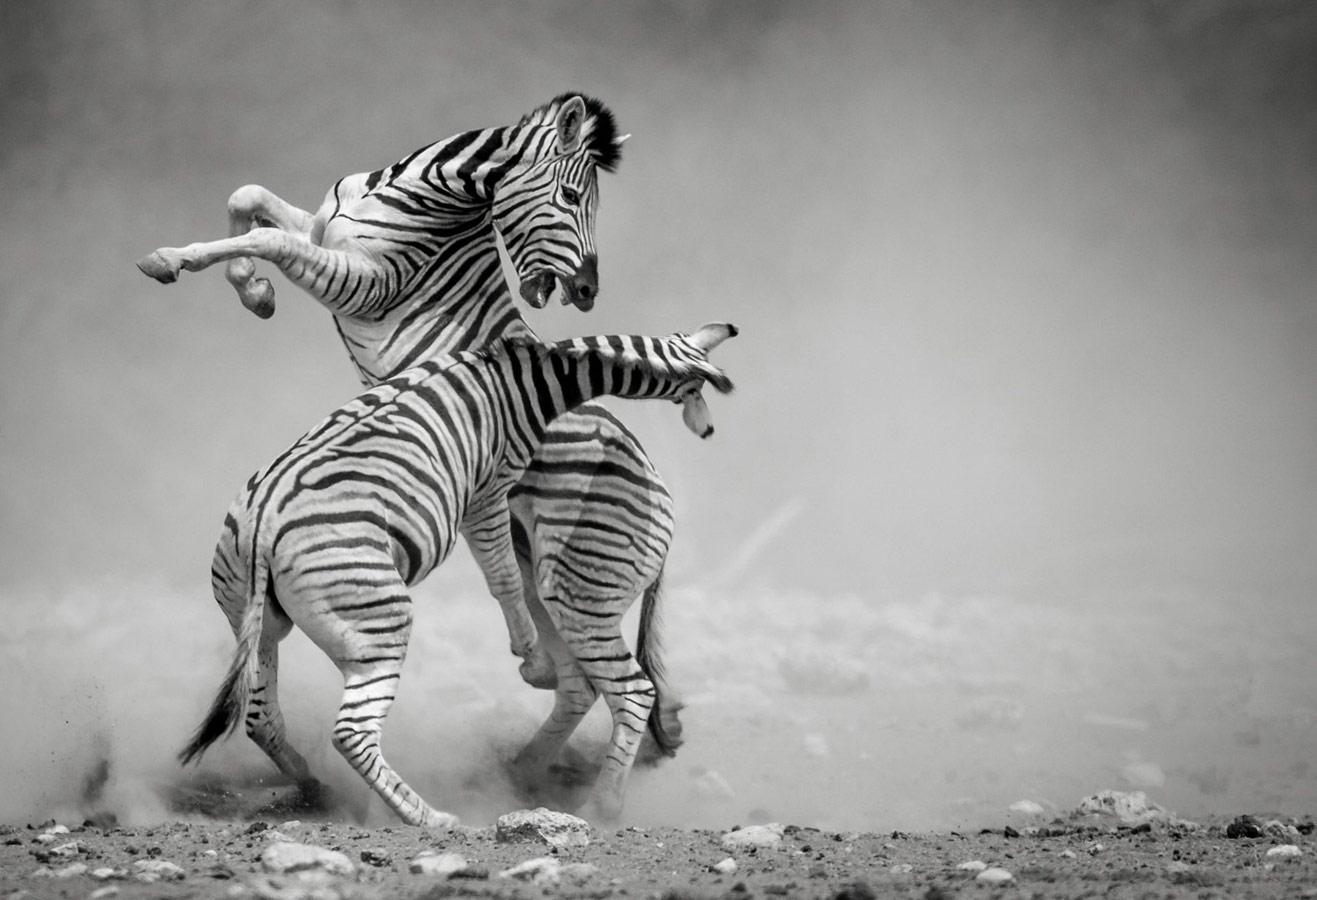 Дуэль, © Соналини Хетрапал, Индия, 3 место, Фотоконкурс Siena